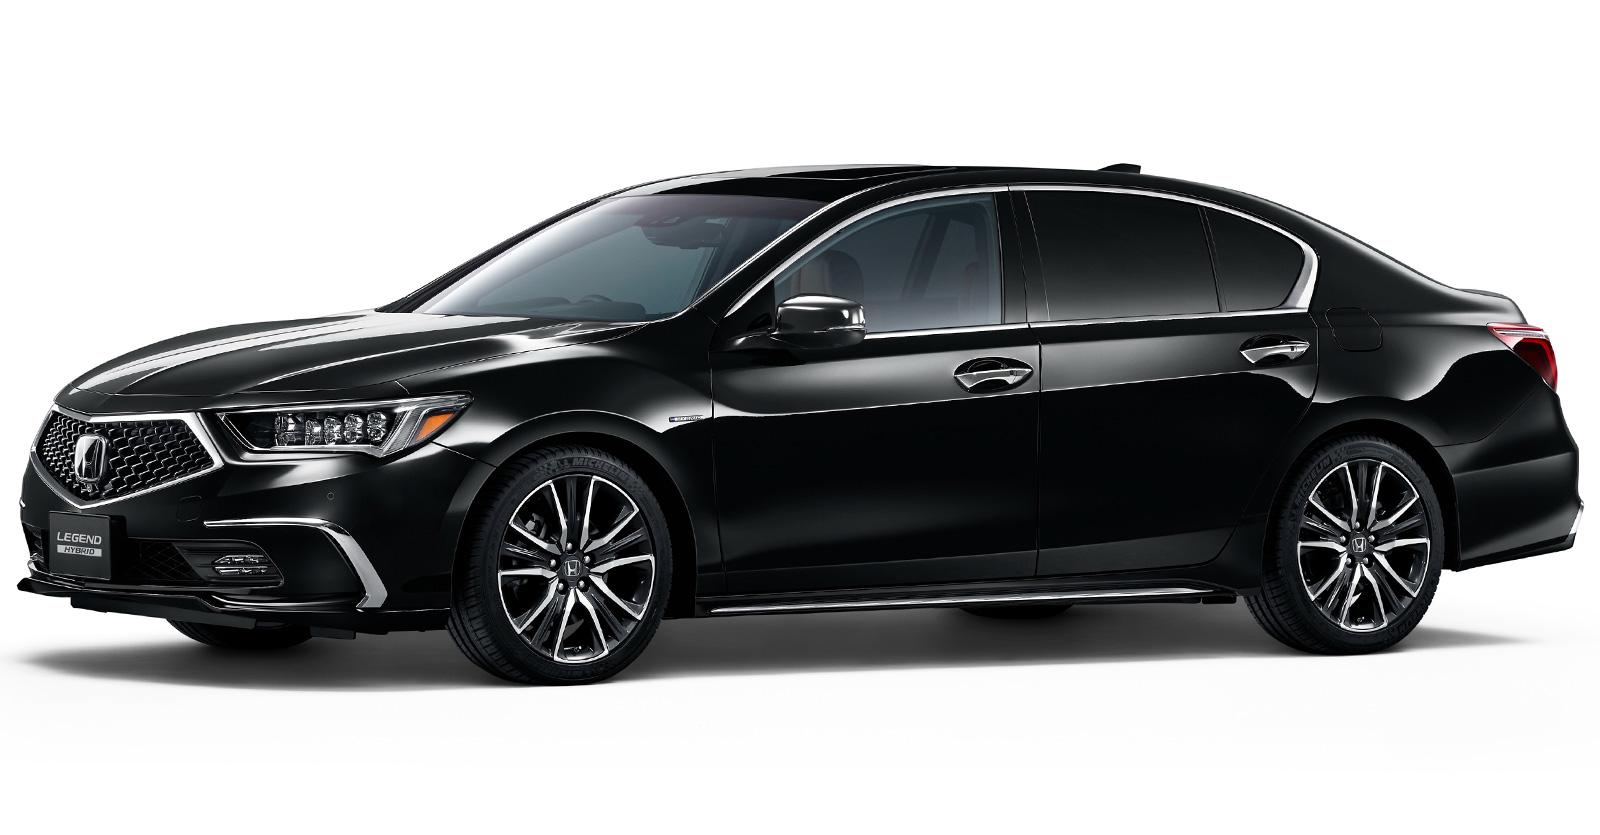 Honda Legend 5 (2020-2021) цена и характеристики, фотографии и обзор